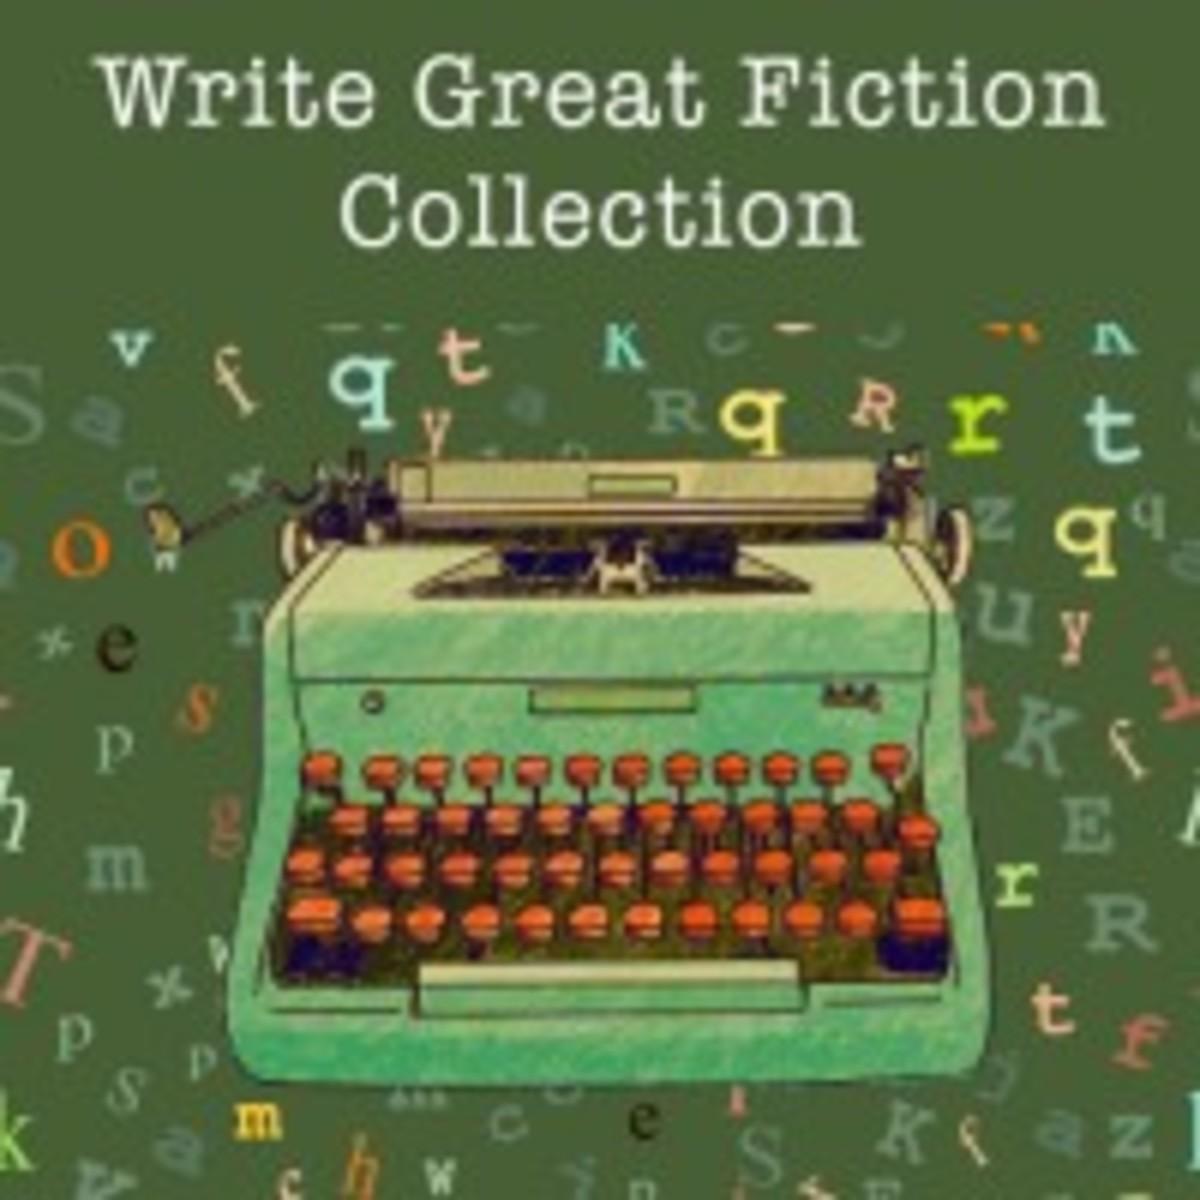 12576_wd_writegreatfiction_product